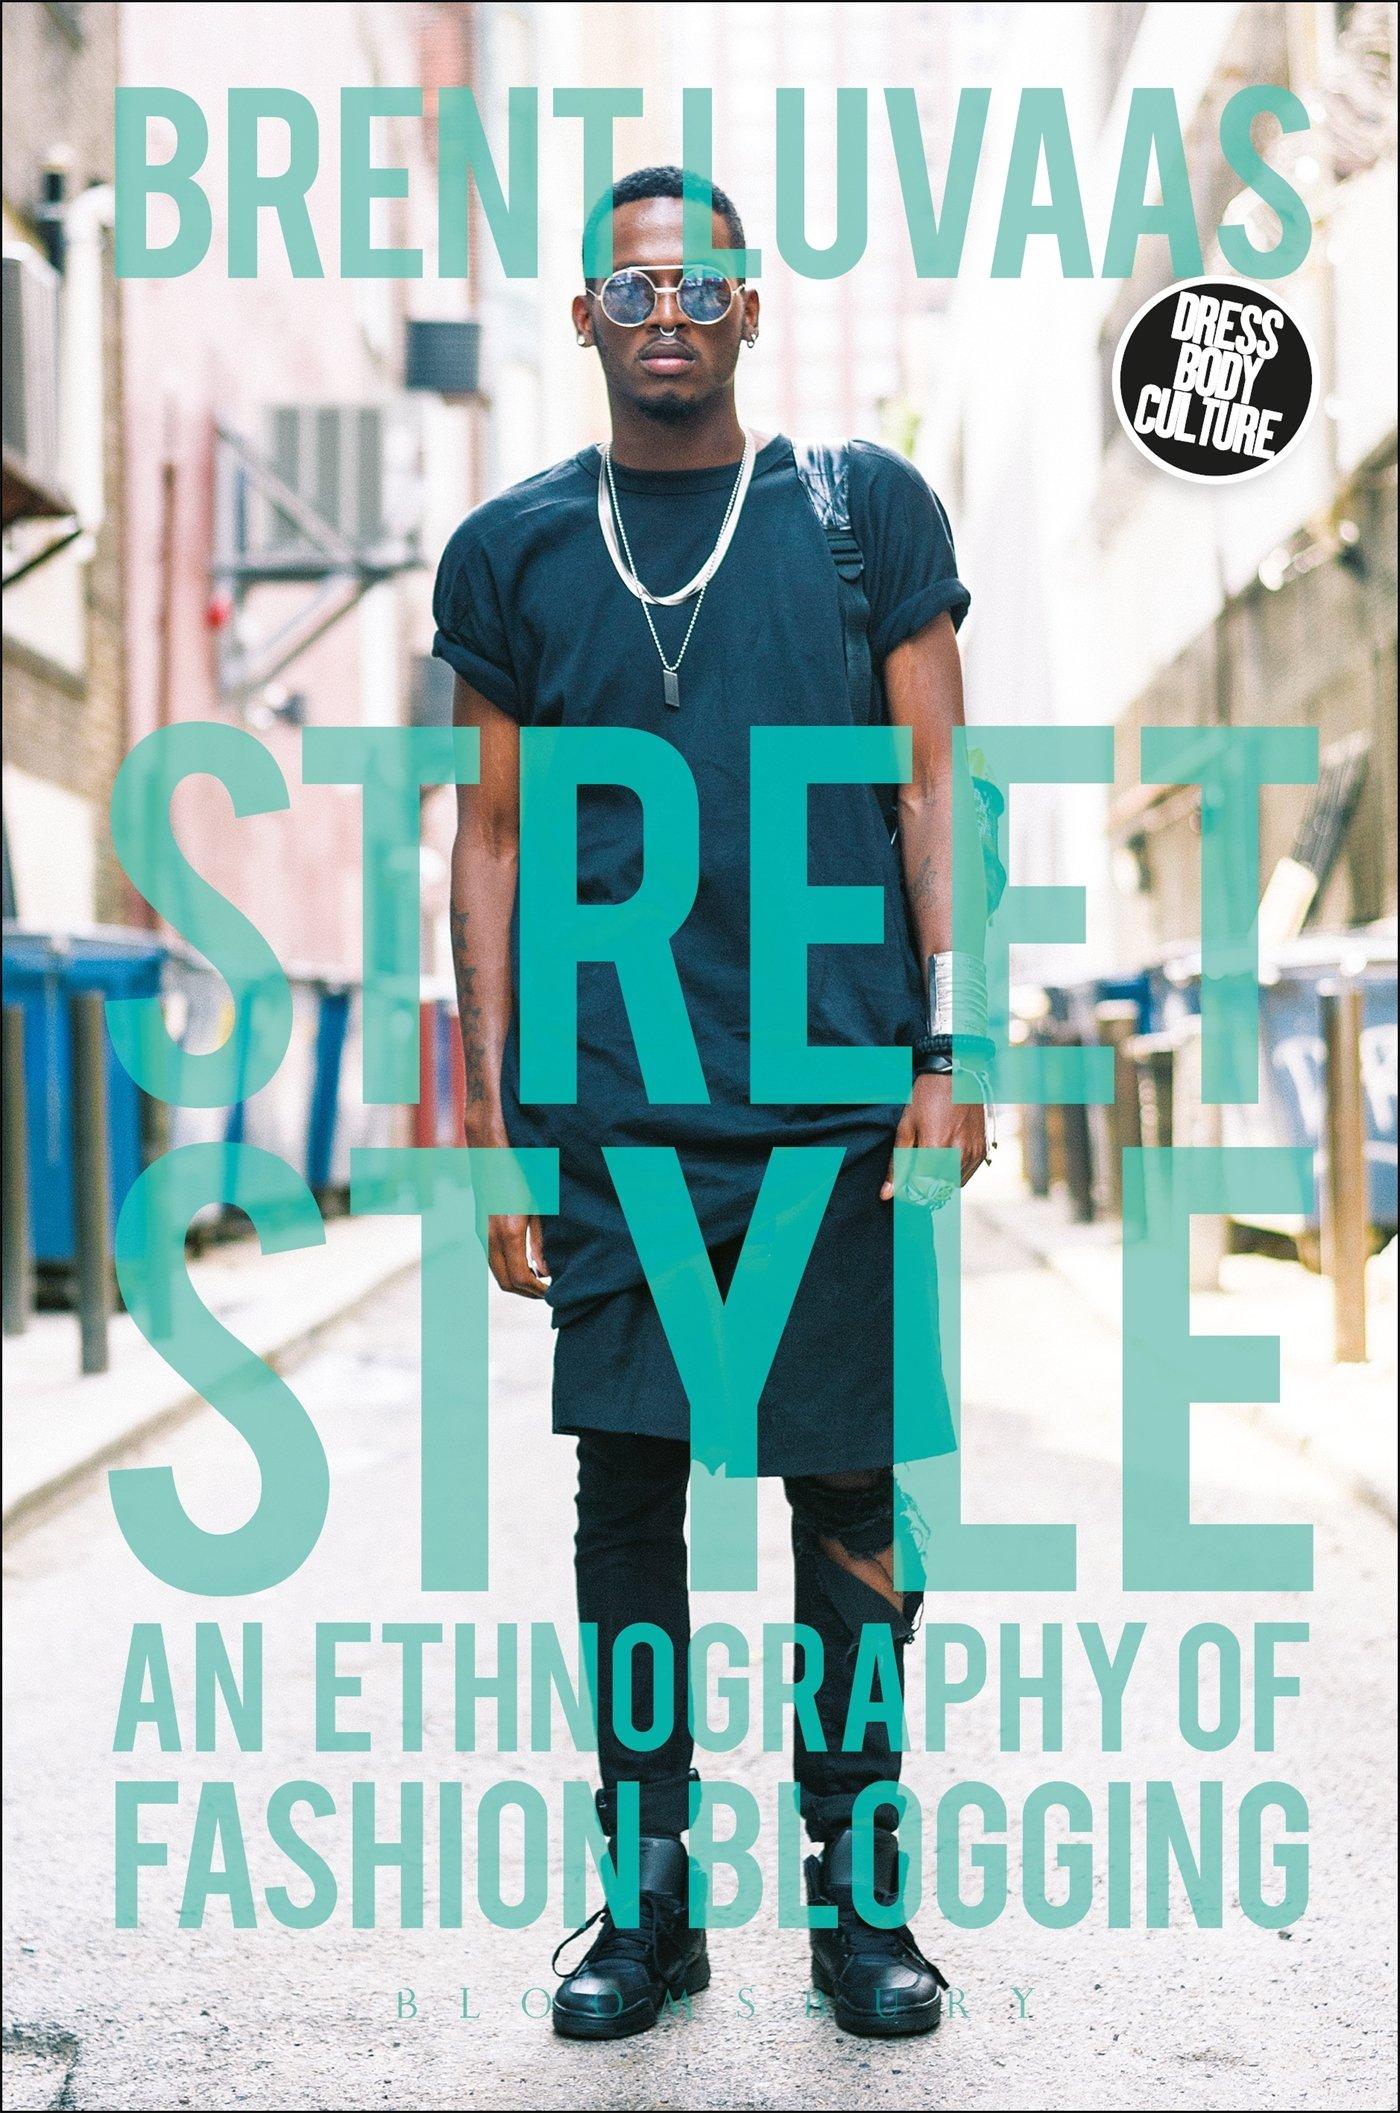 Steet Style- Ethnography of Fashion Blogging